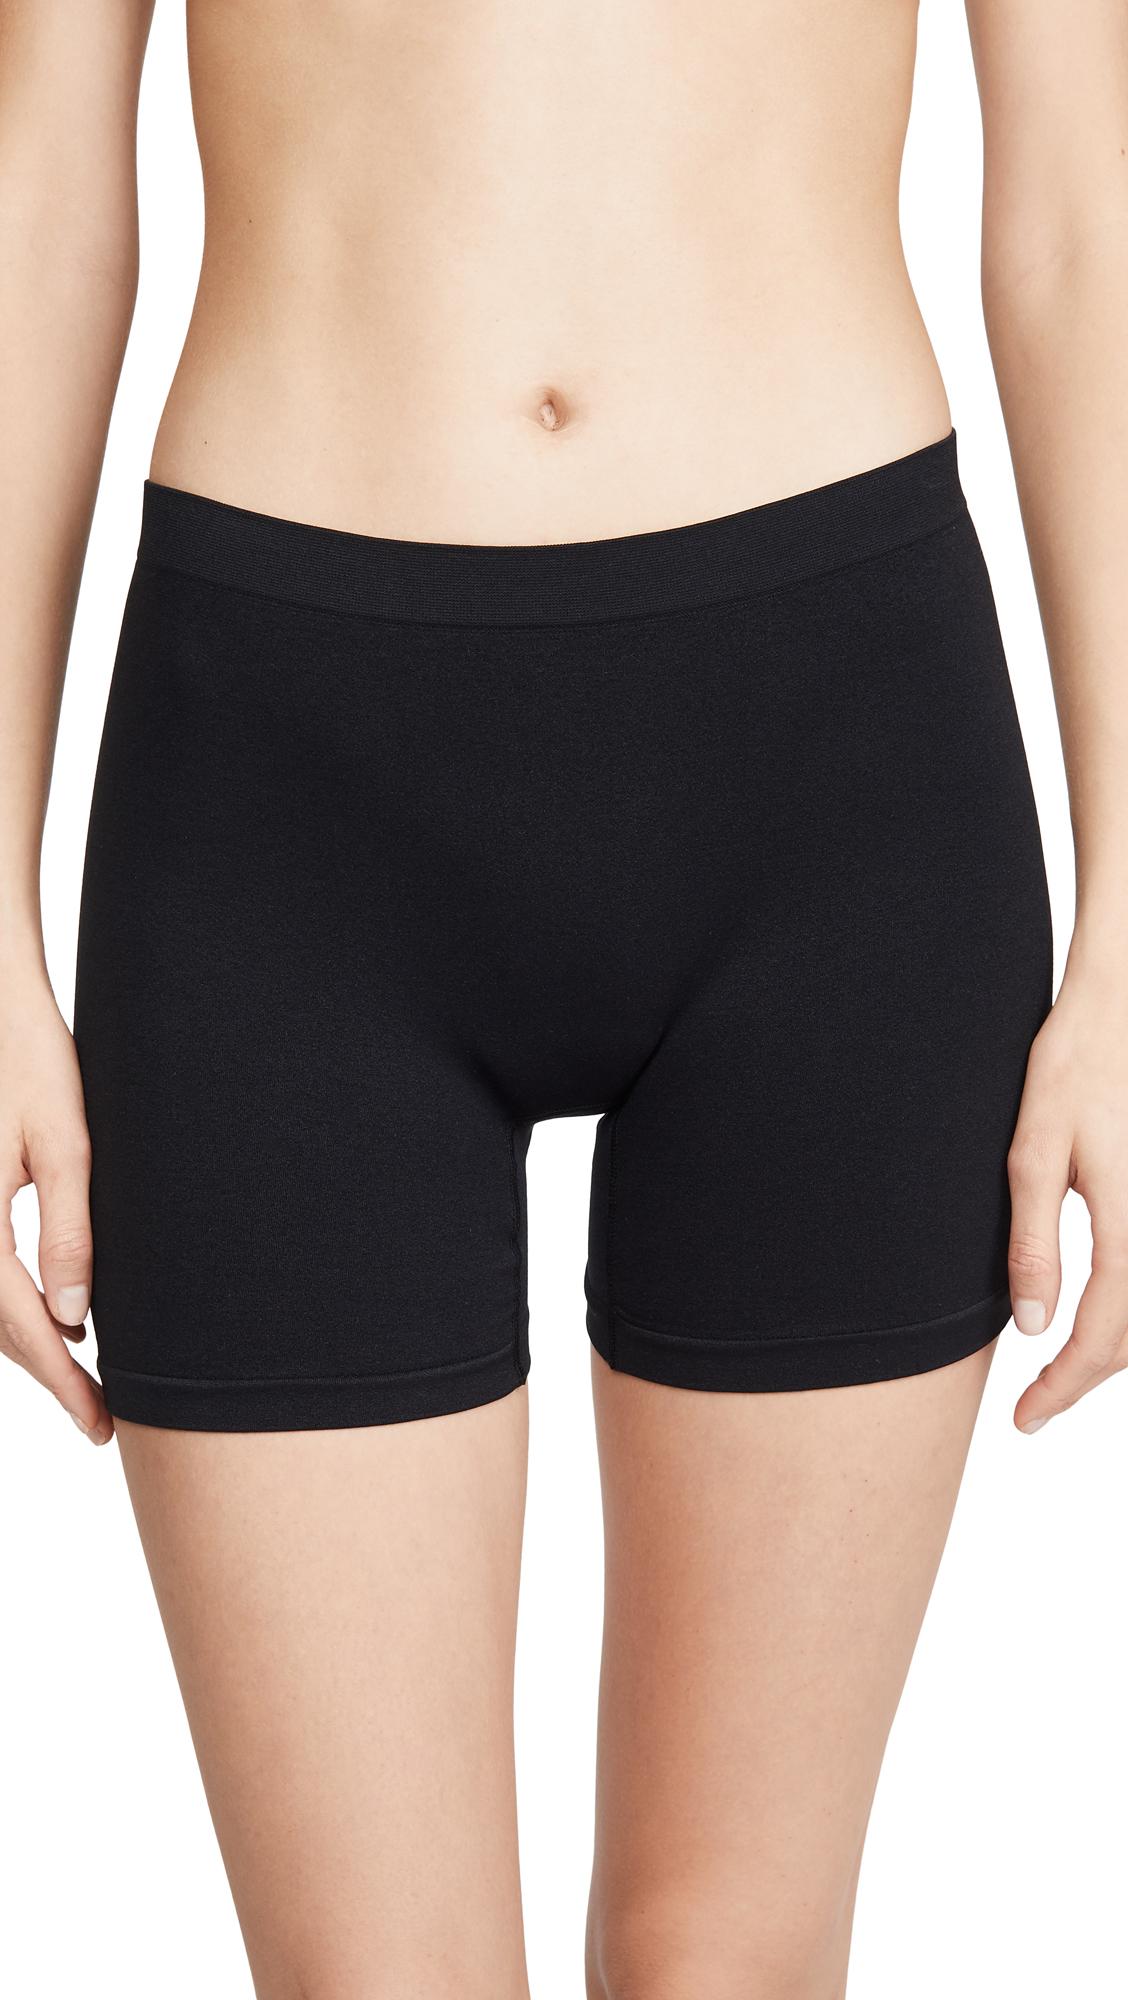 BB Dakota Caiden Seamless Bike Shorts